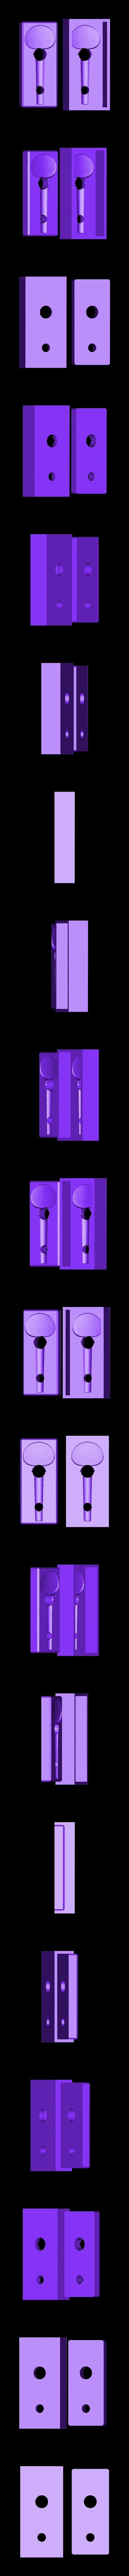 16c-peg-mbox.stl Download free STL file Violin • 3D print design, jteix